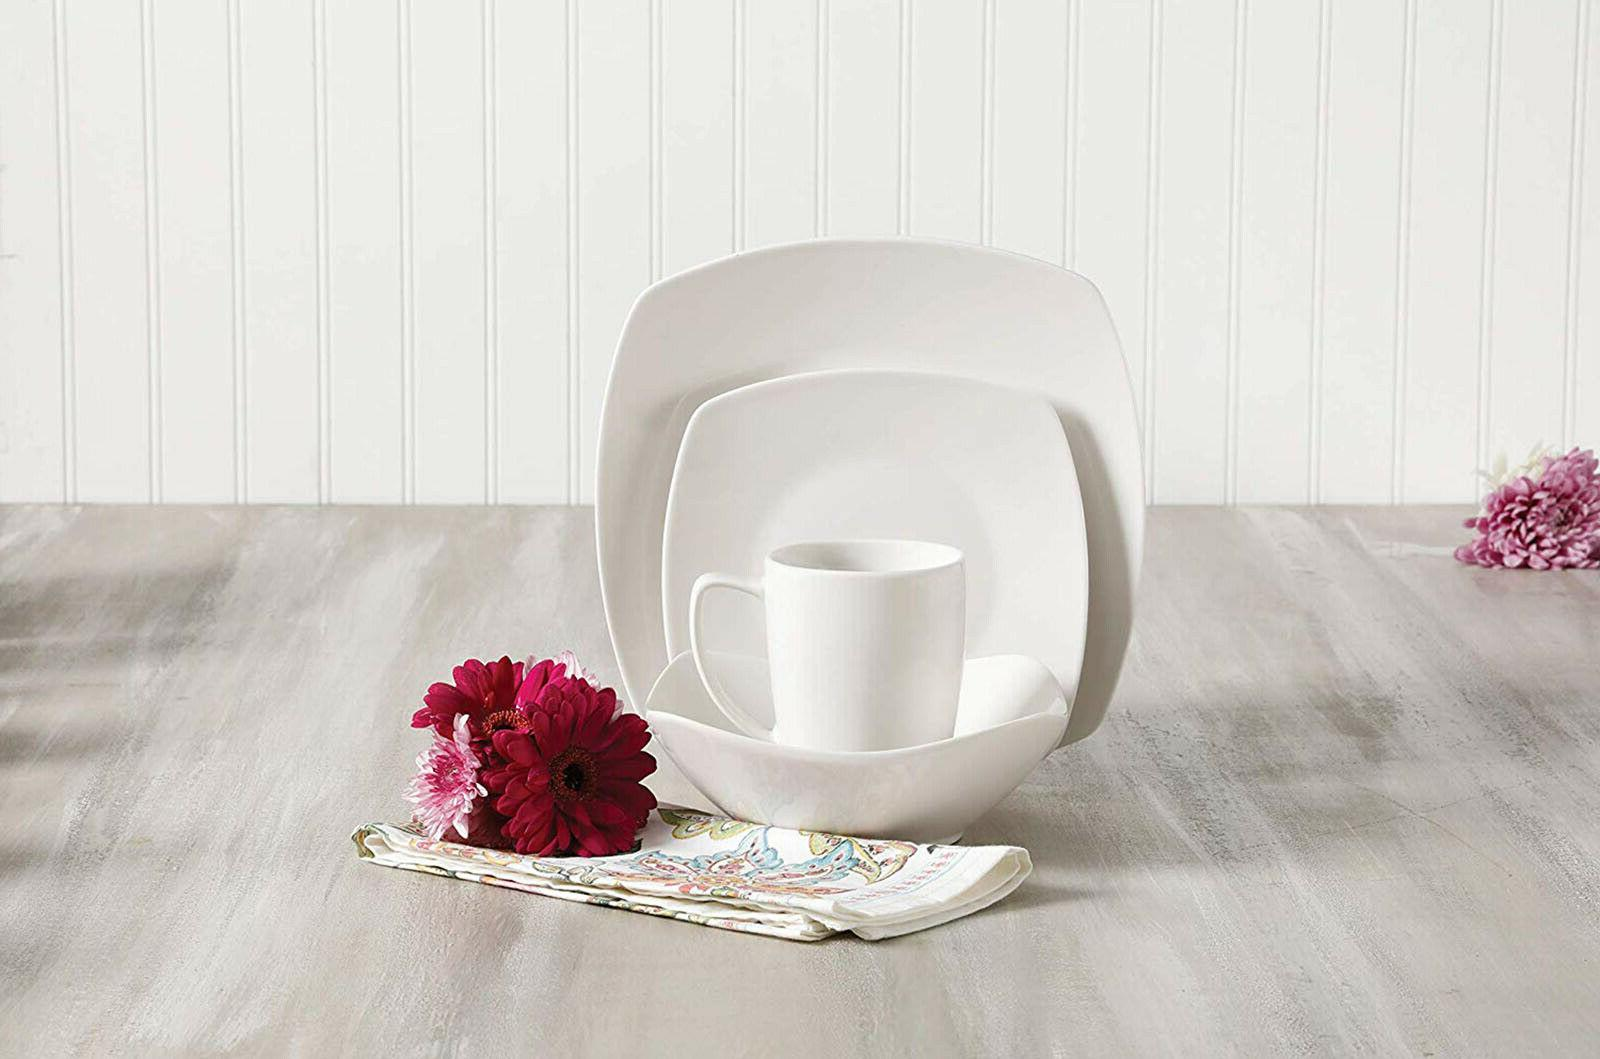 16 Piece Porcelain Dinnerware Set Plates Service 4